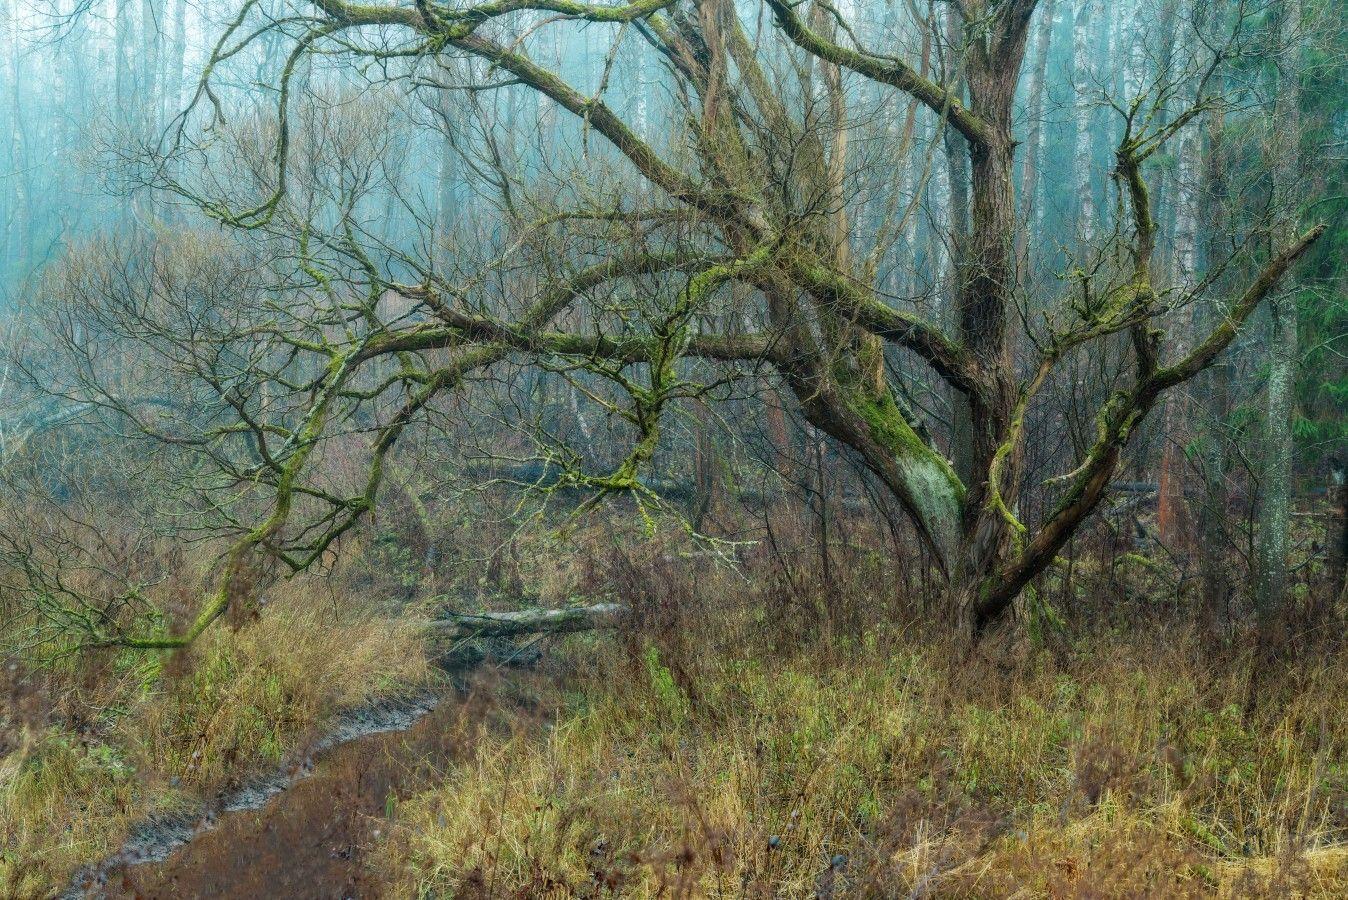 Лесной монстр петербург осень невский лесопарк туман утро дерево